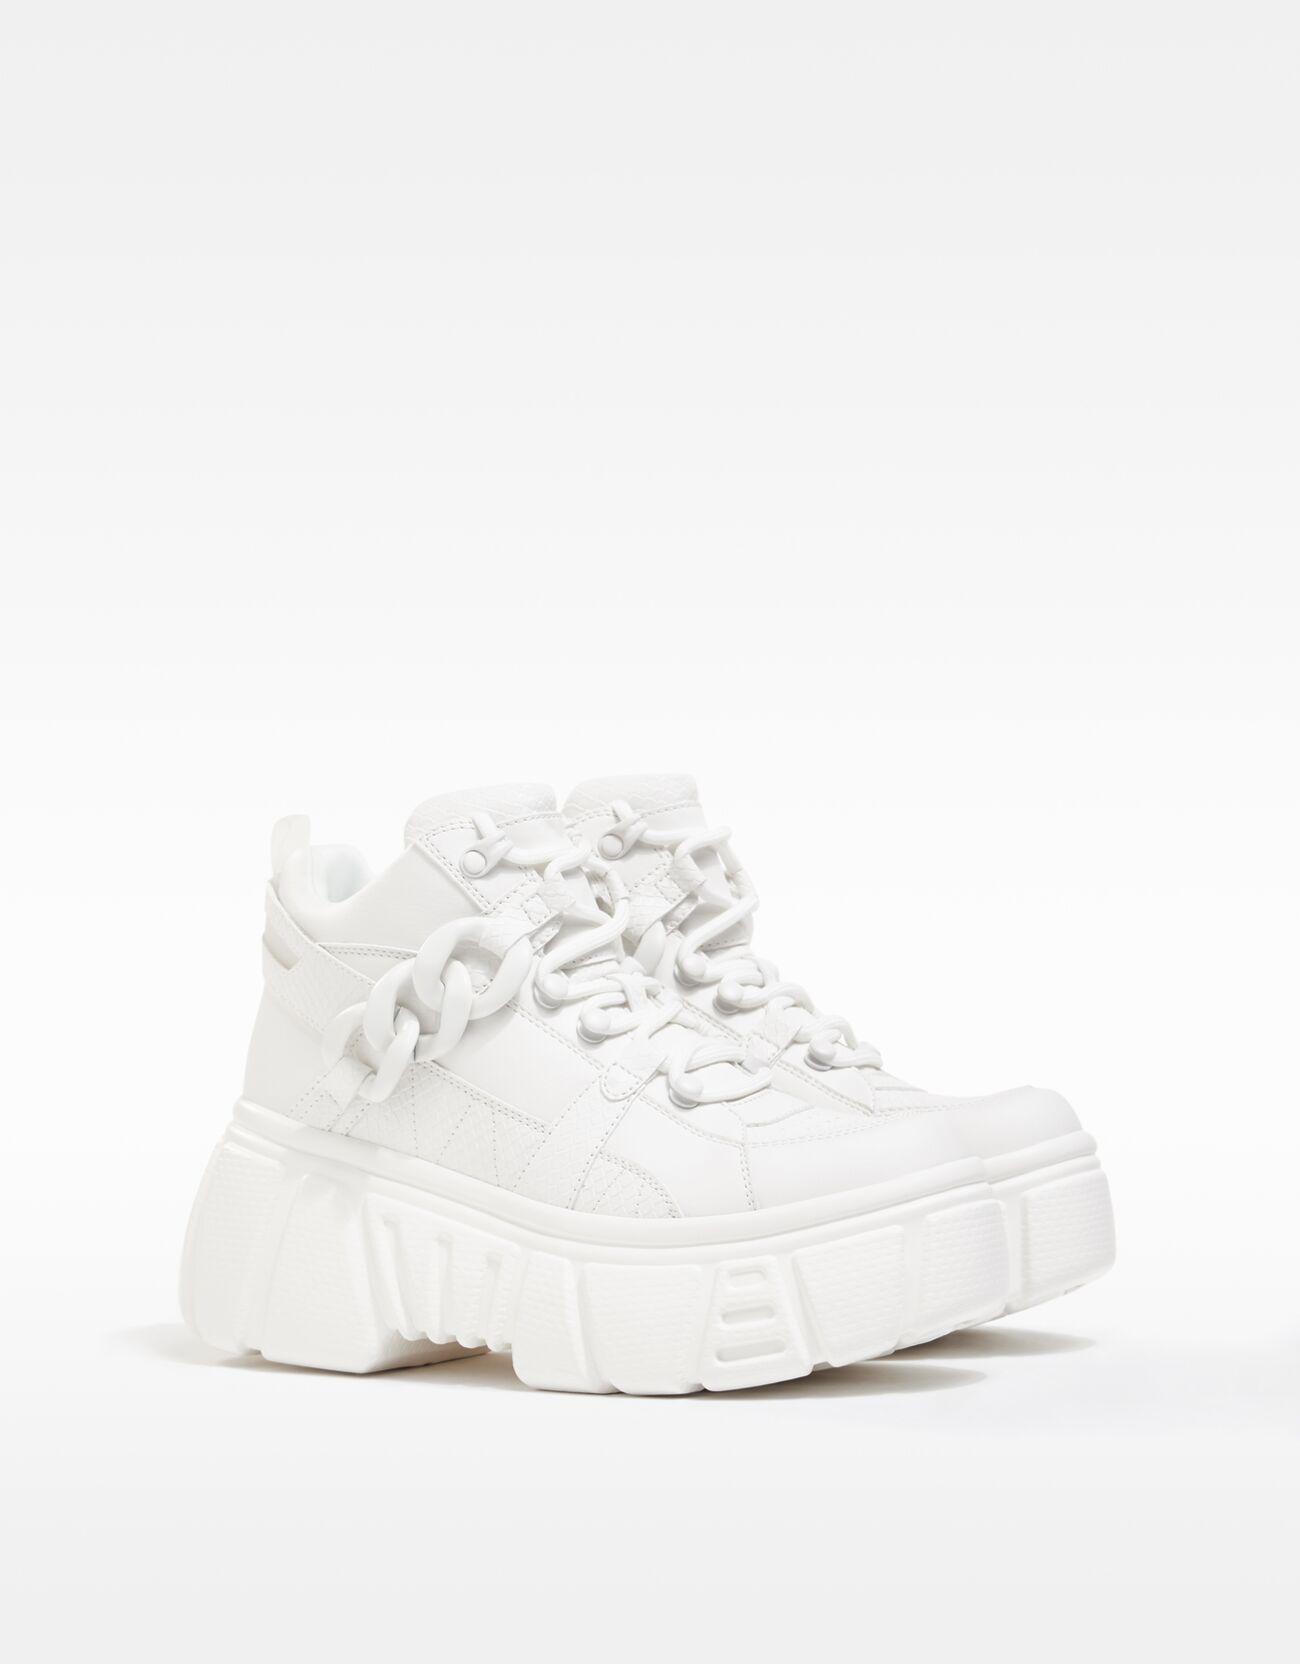 bershka -  Sneaker Mit Xl Plateau Und Ketten Damen 41 Weiss